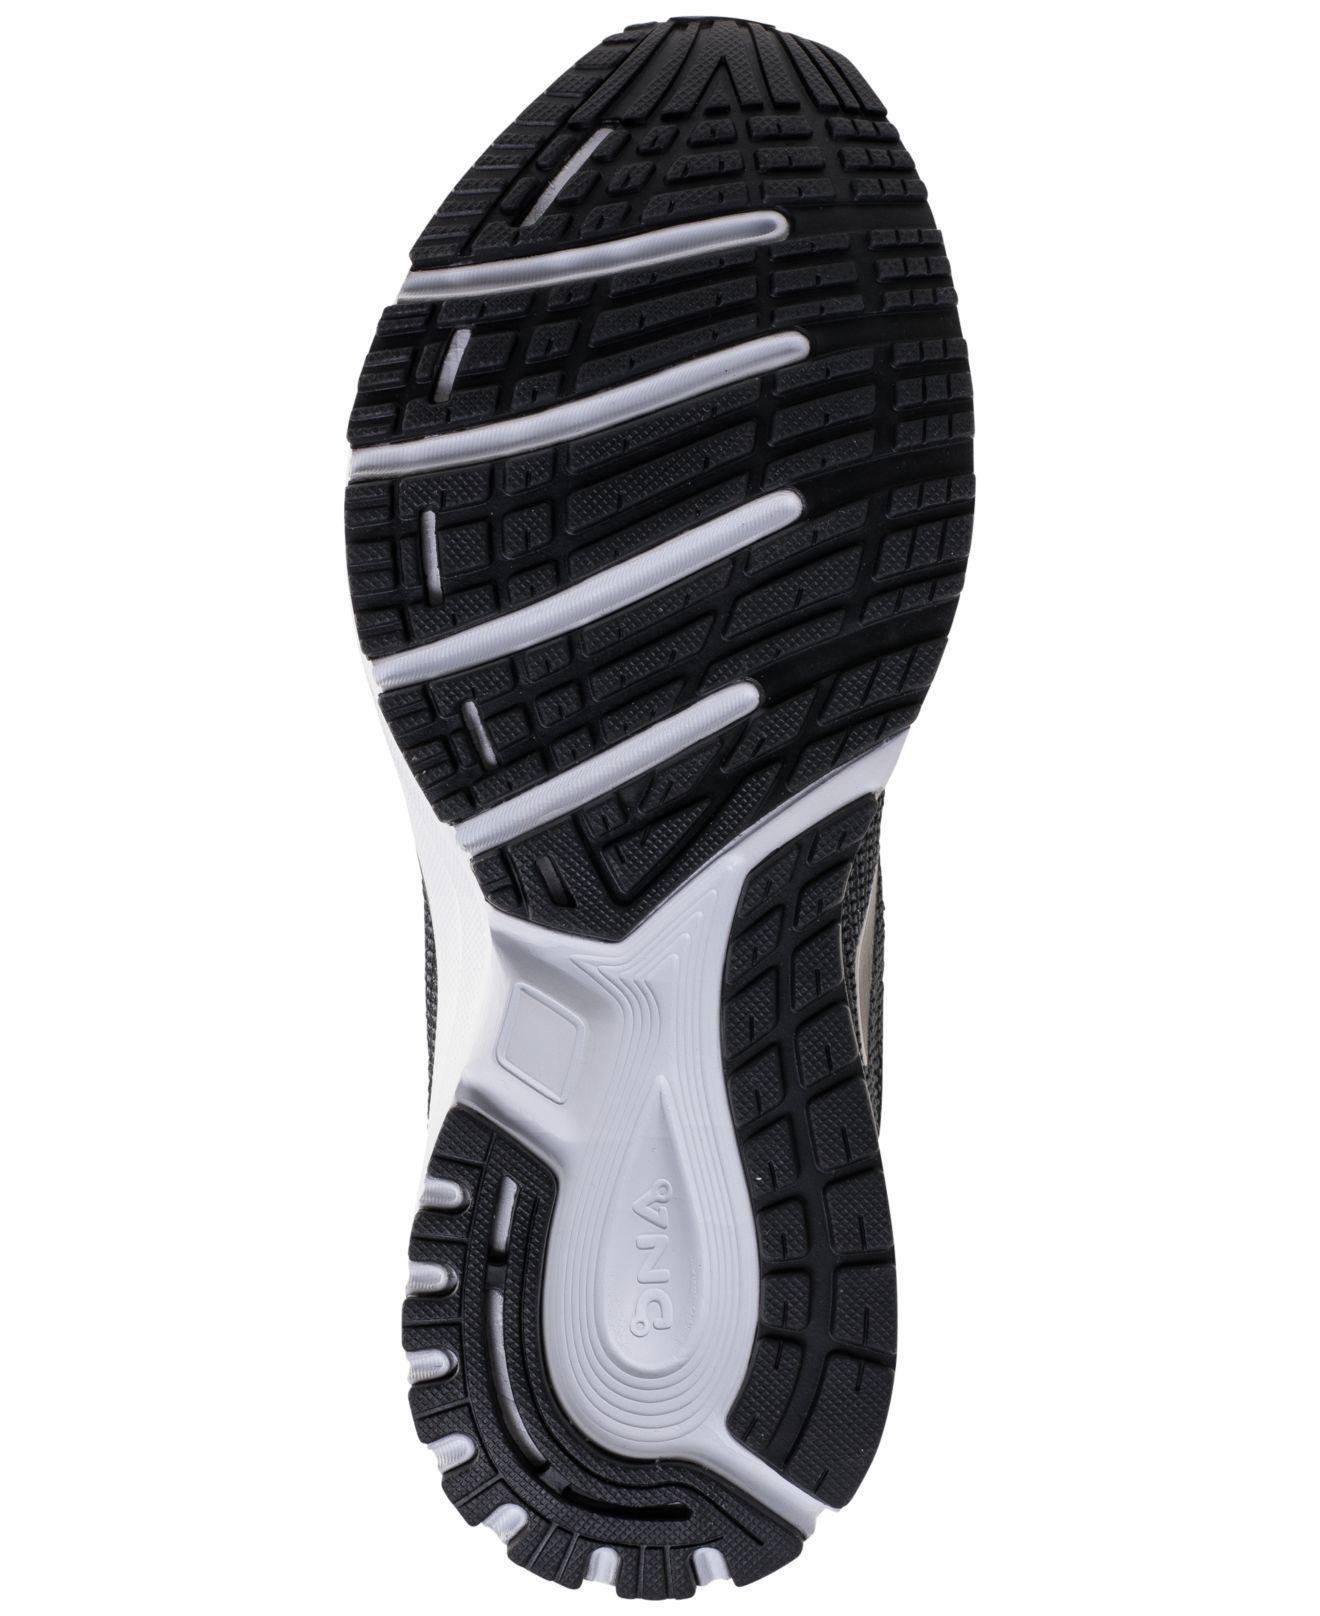 7ea13bd9034 Brooks - Gray Revel 2 Running Sneakers From Finish Line - Lyst. View  fullscreen